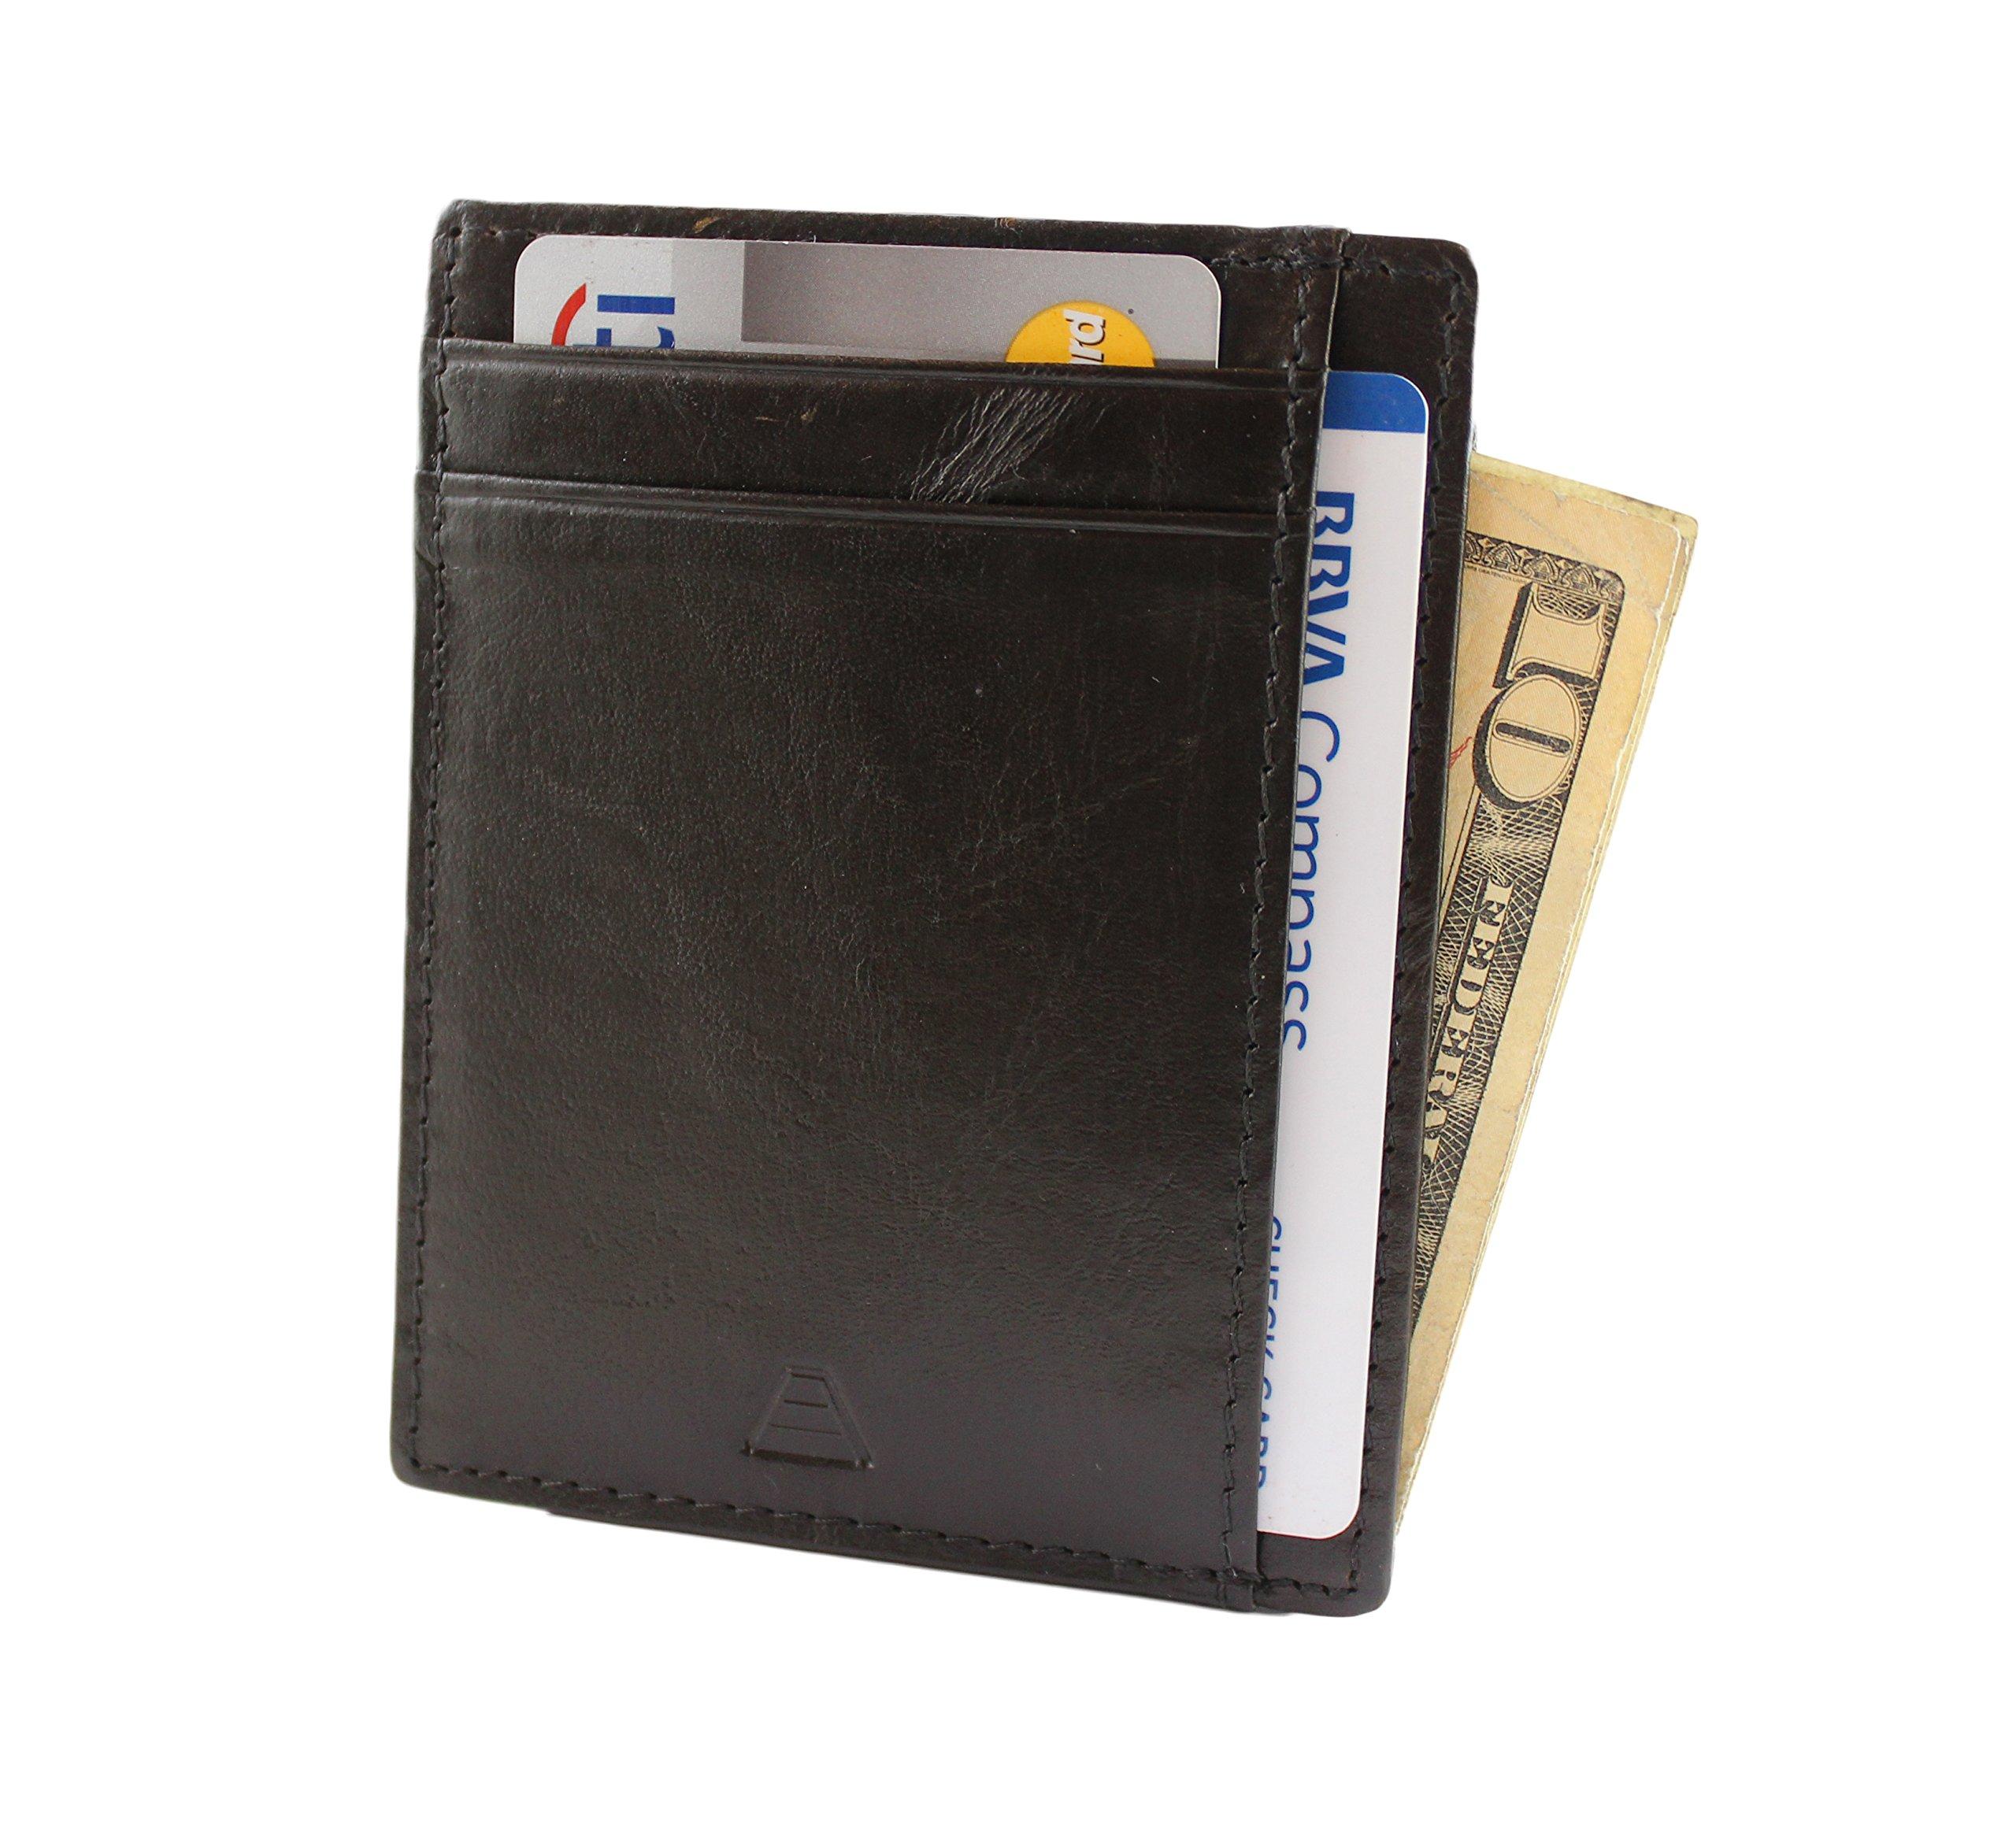 Andar RFID Minimalist Front Pocket Wallet - Made of Classy Full Grain Leather (Black)